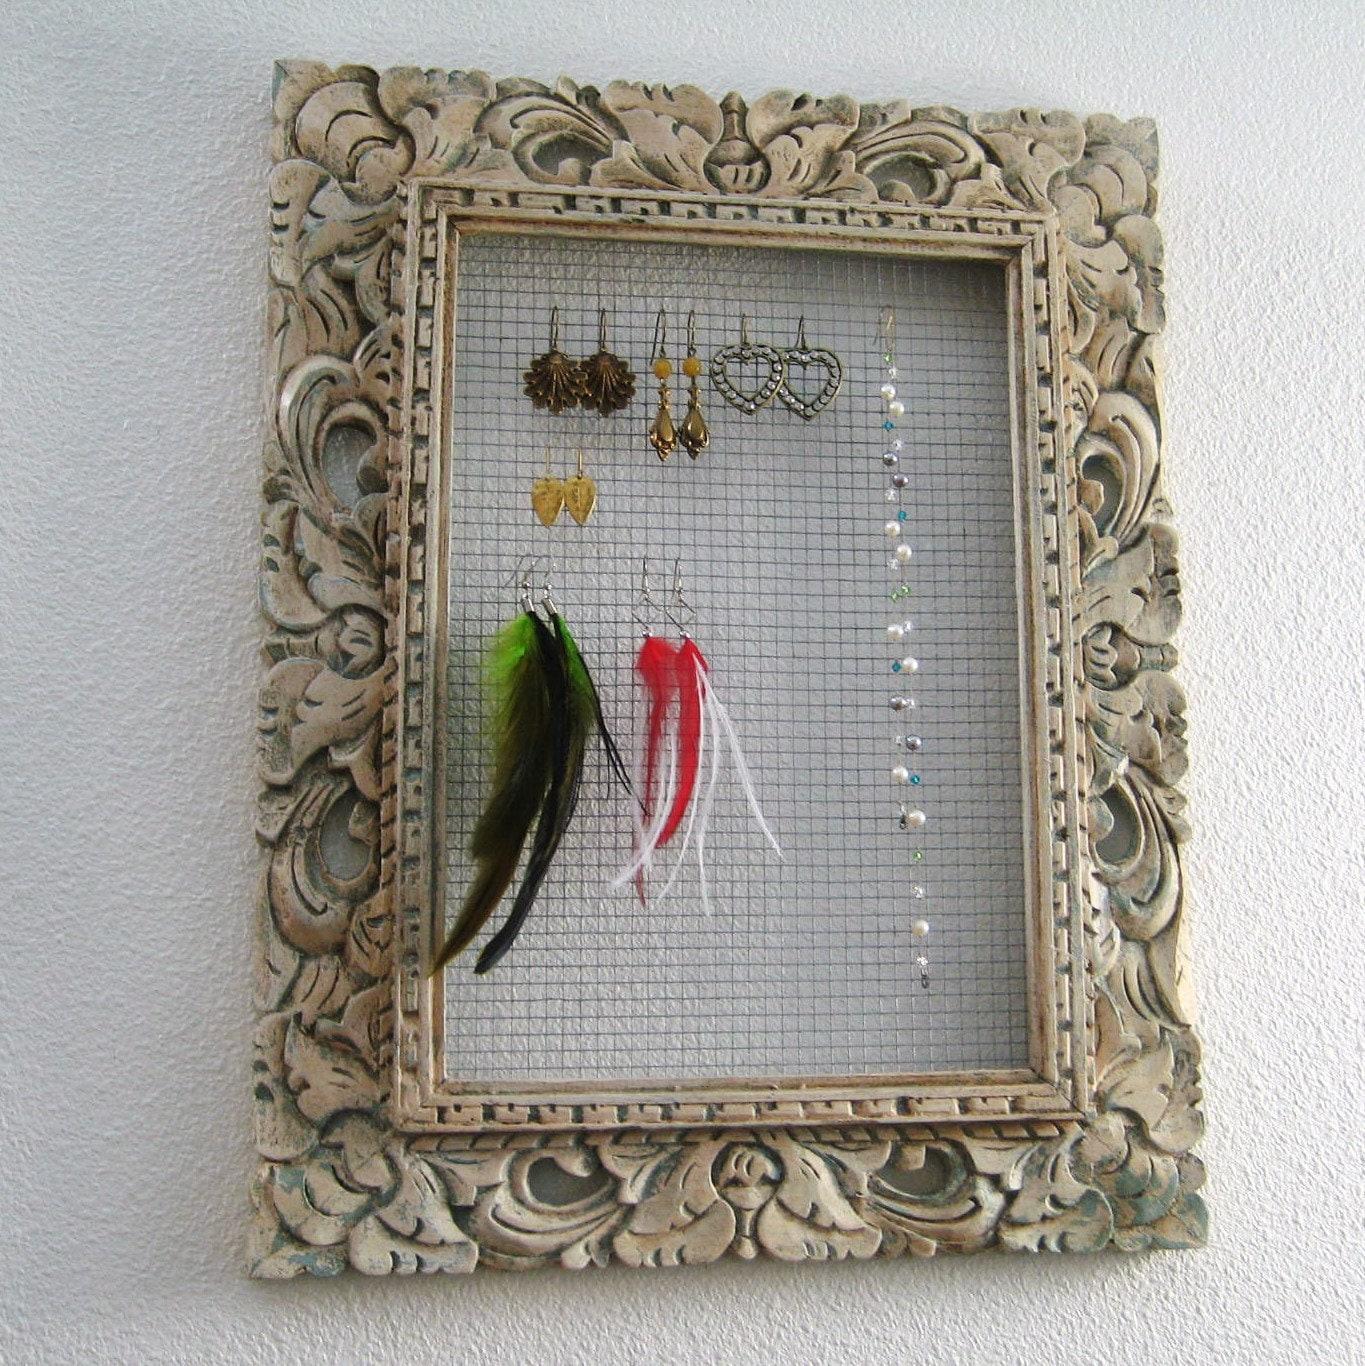 Custom Jewelry Display Frame: Jewelry Display Frame Rustic Earring Holder Organizer Upcycled